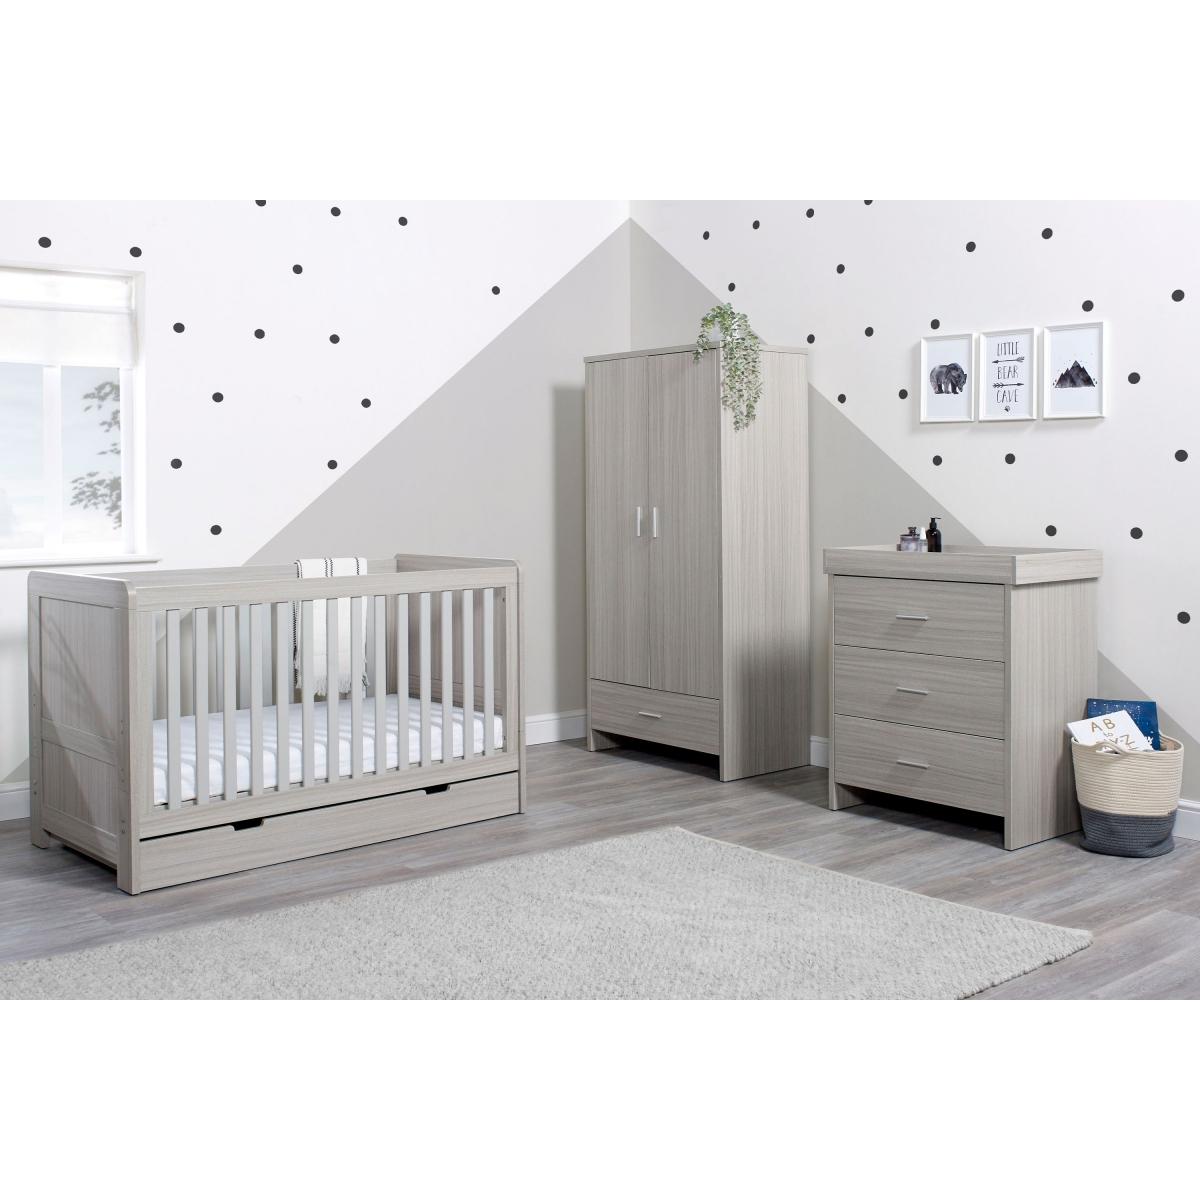 Ickle Bubba Pembrey 3 Piece Furniture Set with Under Drawer-Ash Grey